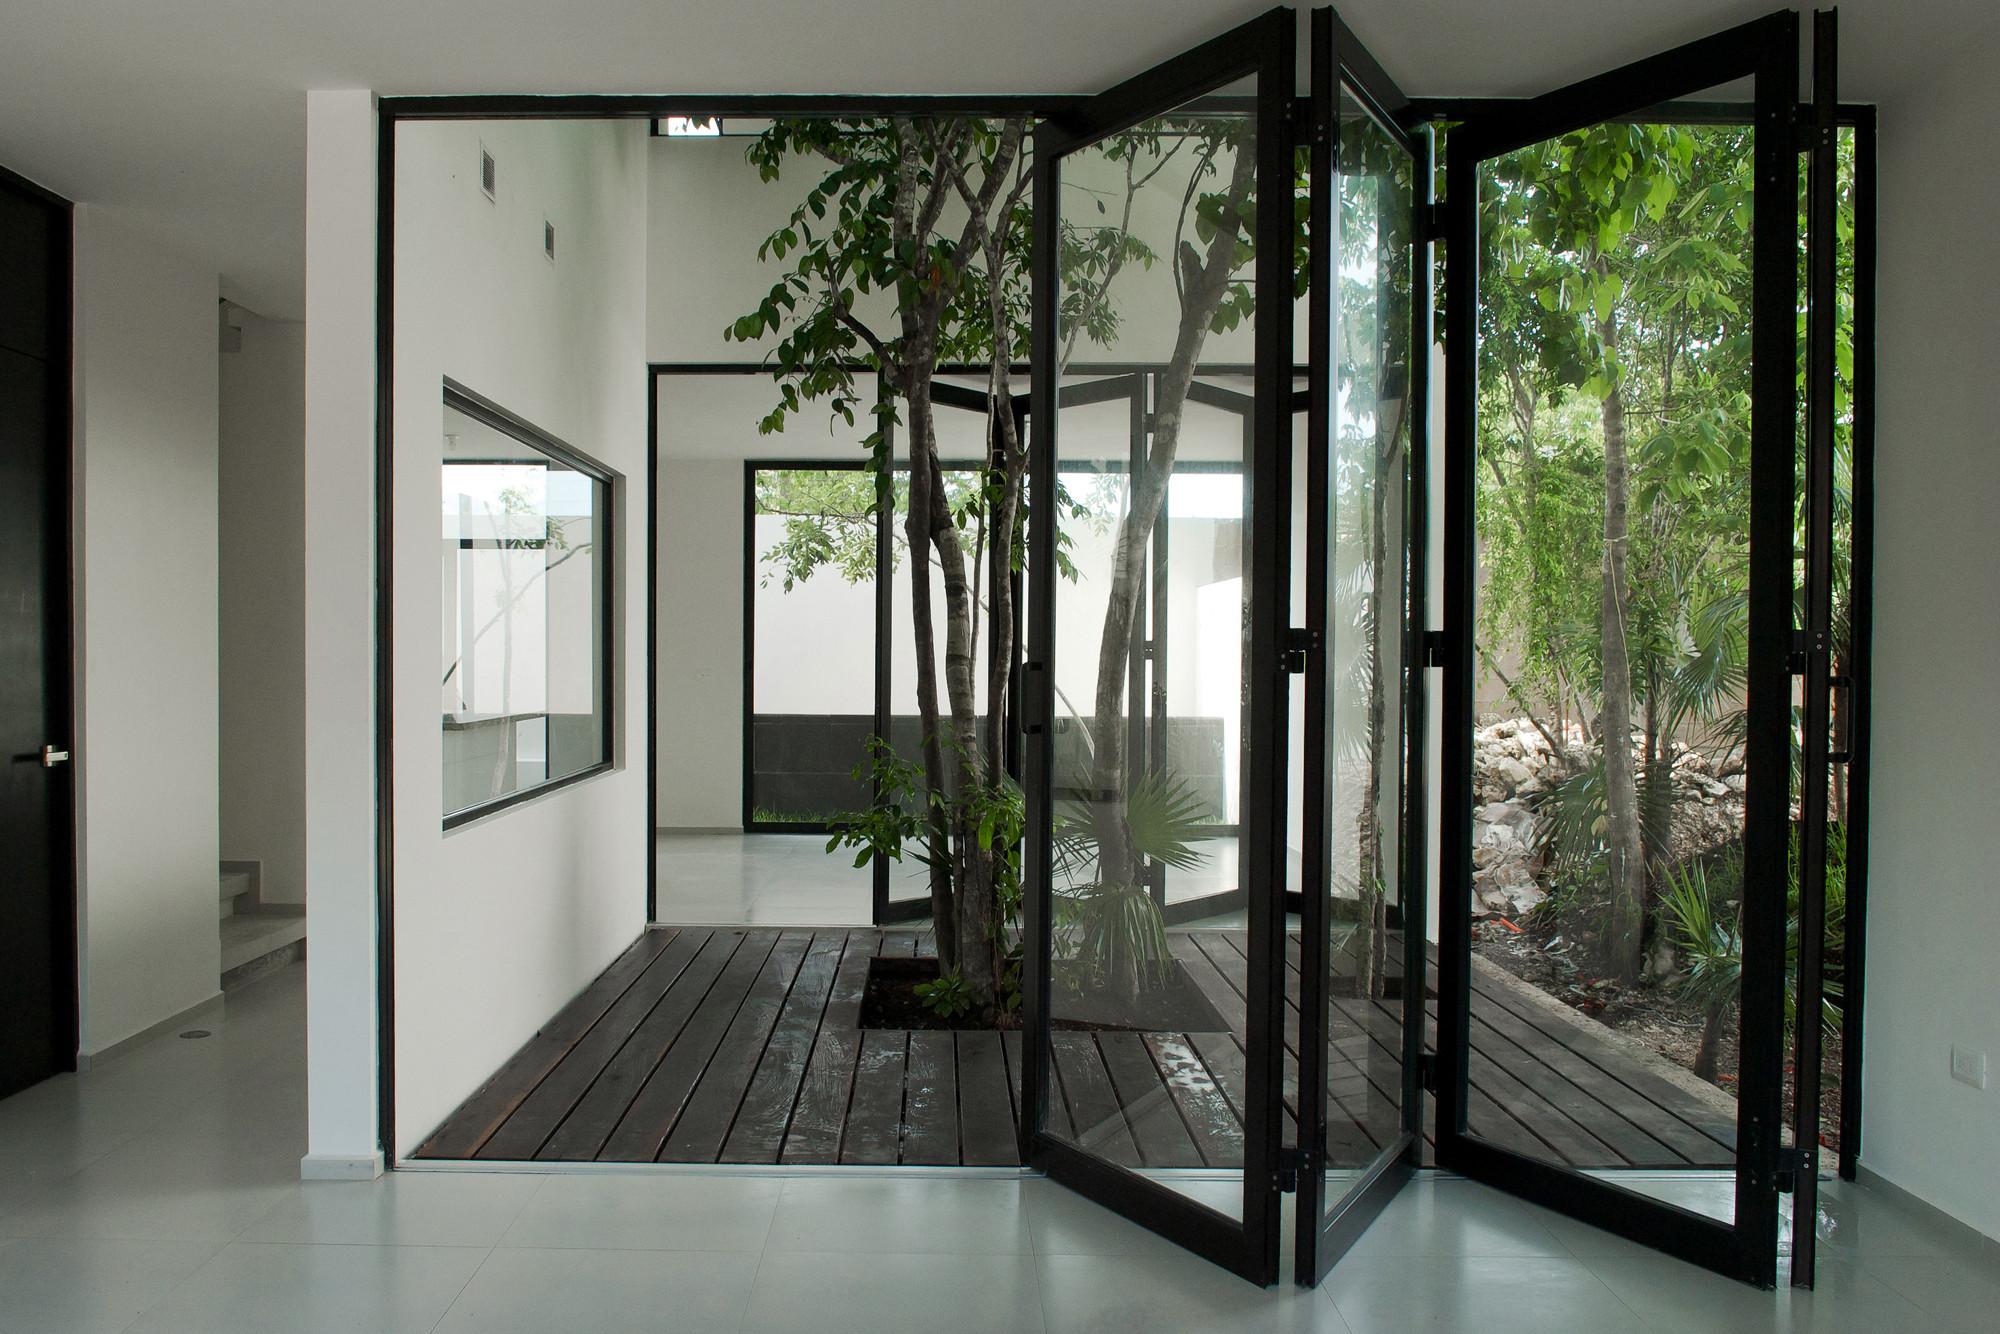 Galer a de casa w41 warmarchitects 5 - Fotos de recibidores de casas ...